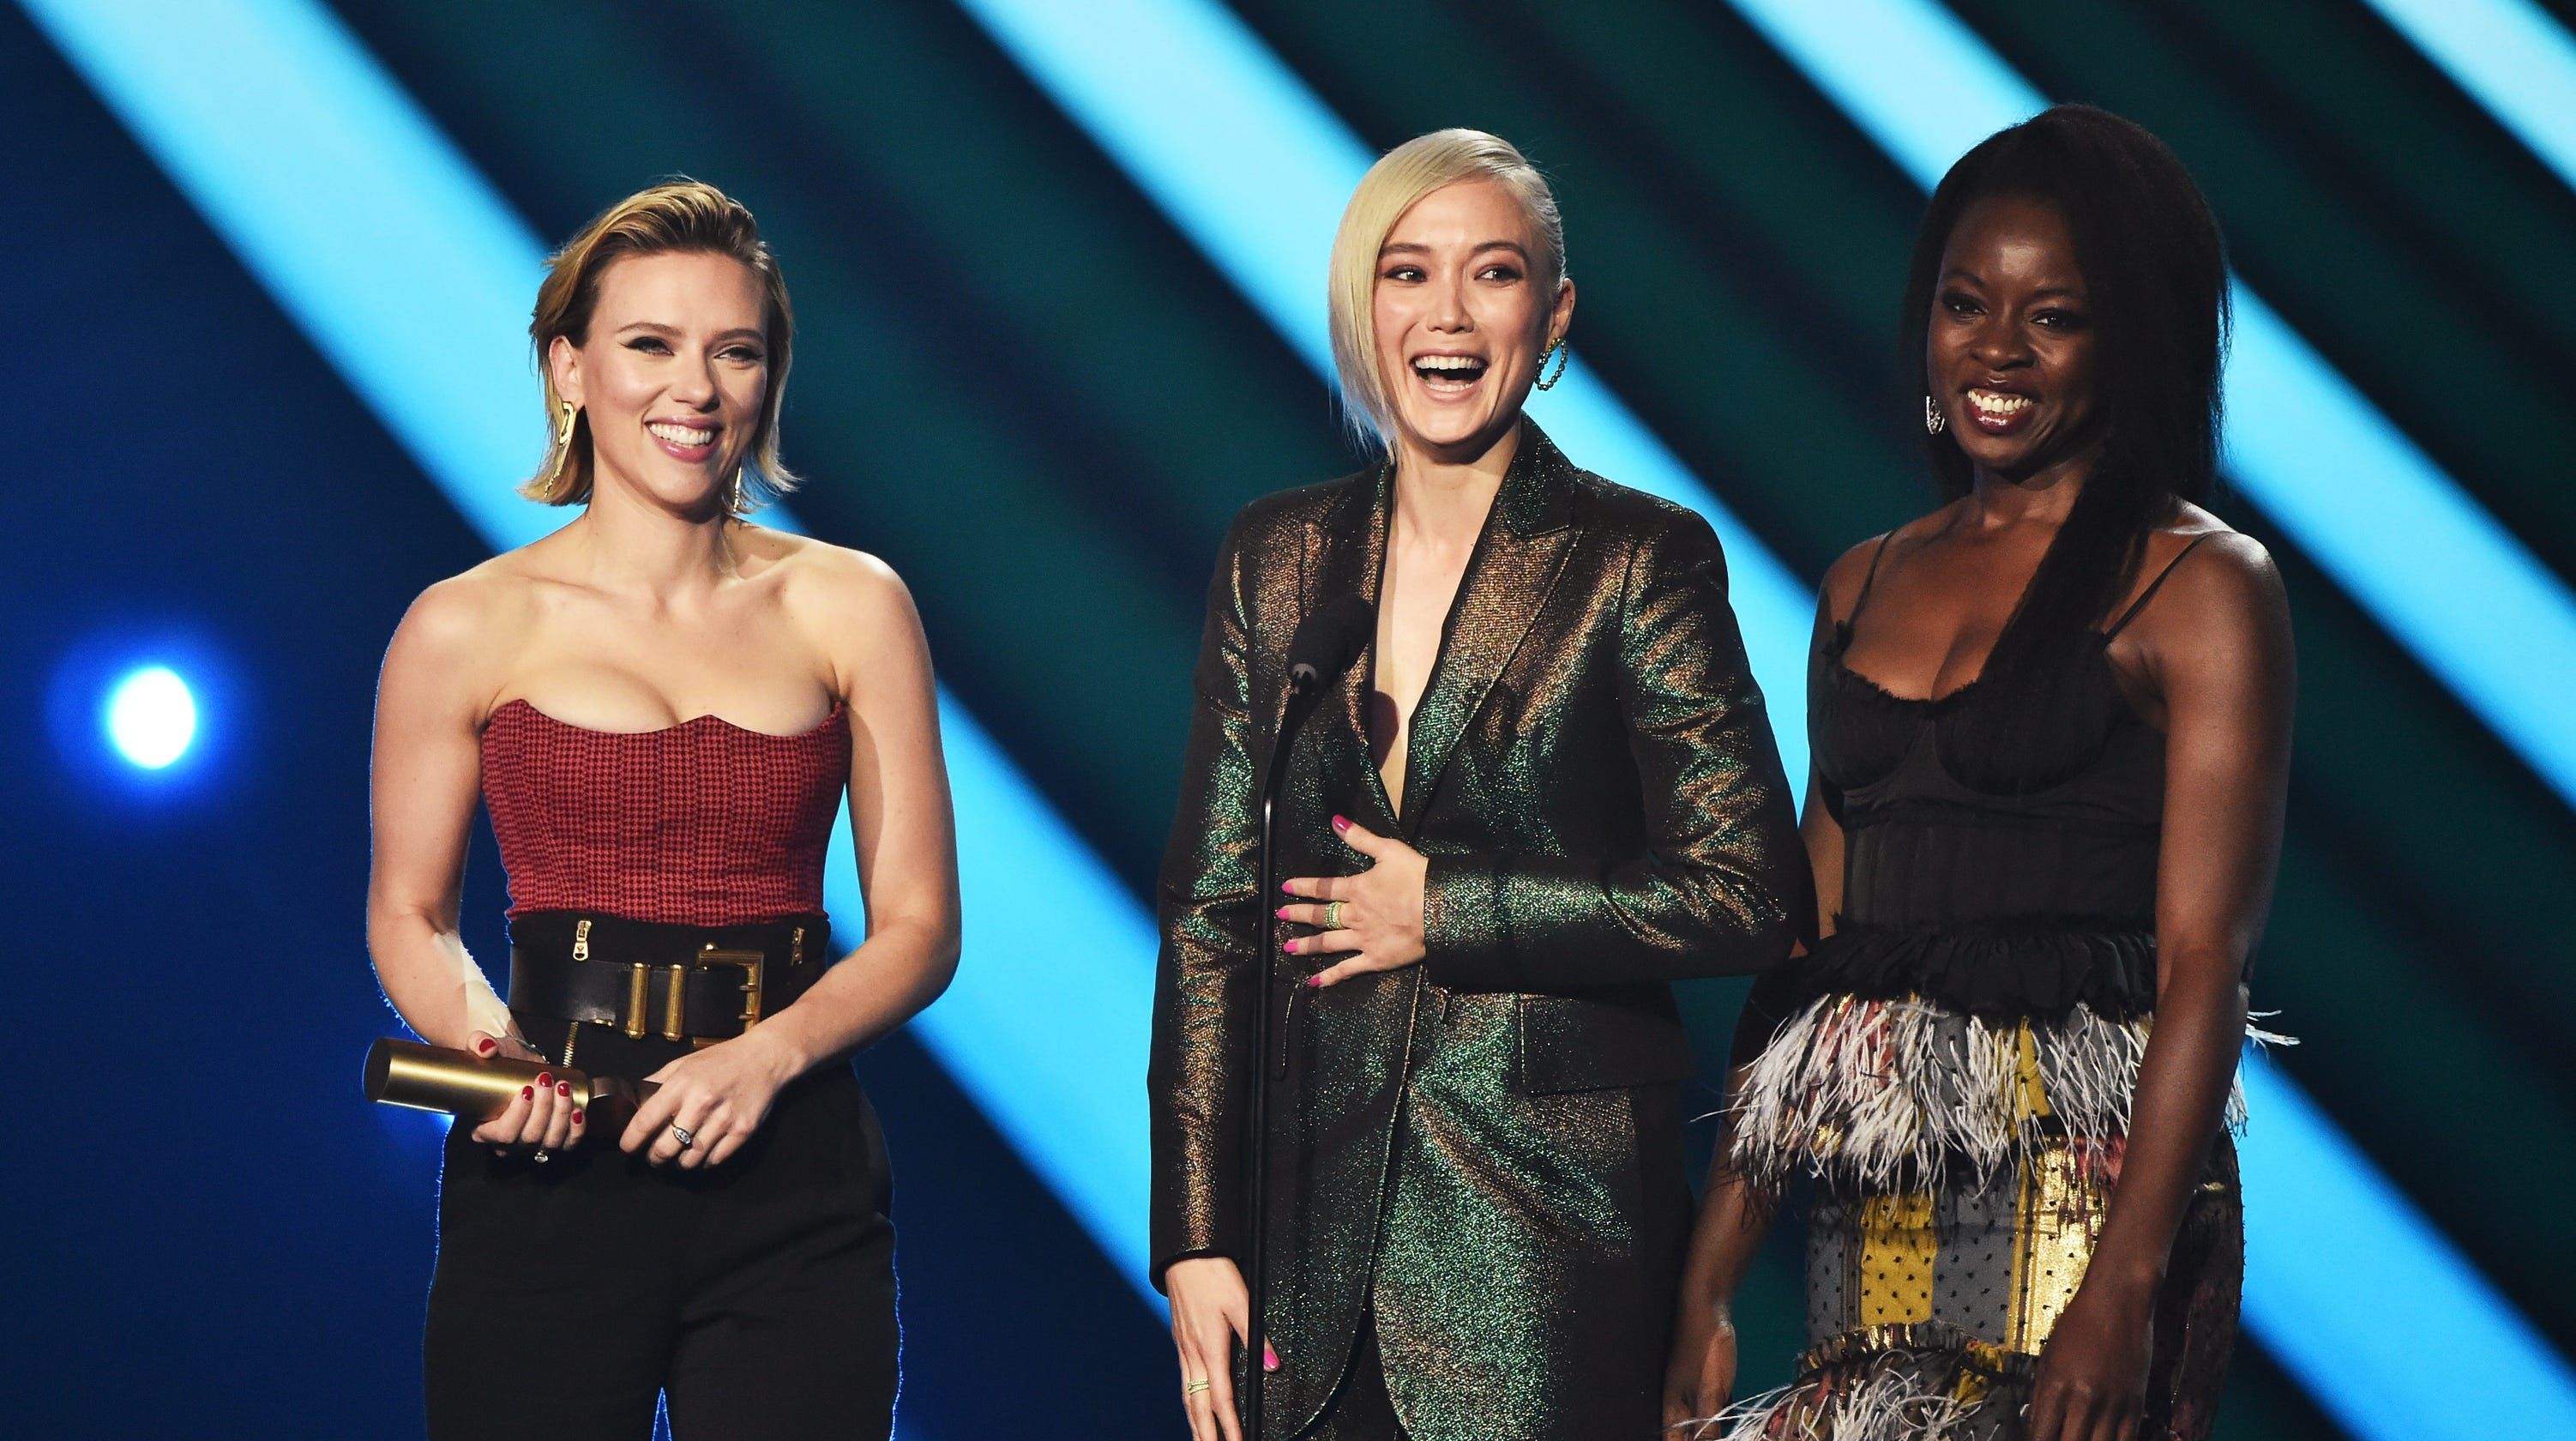 People's Choice Awards 2018: The winners list